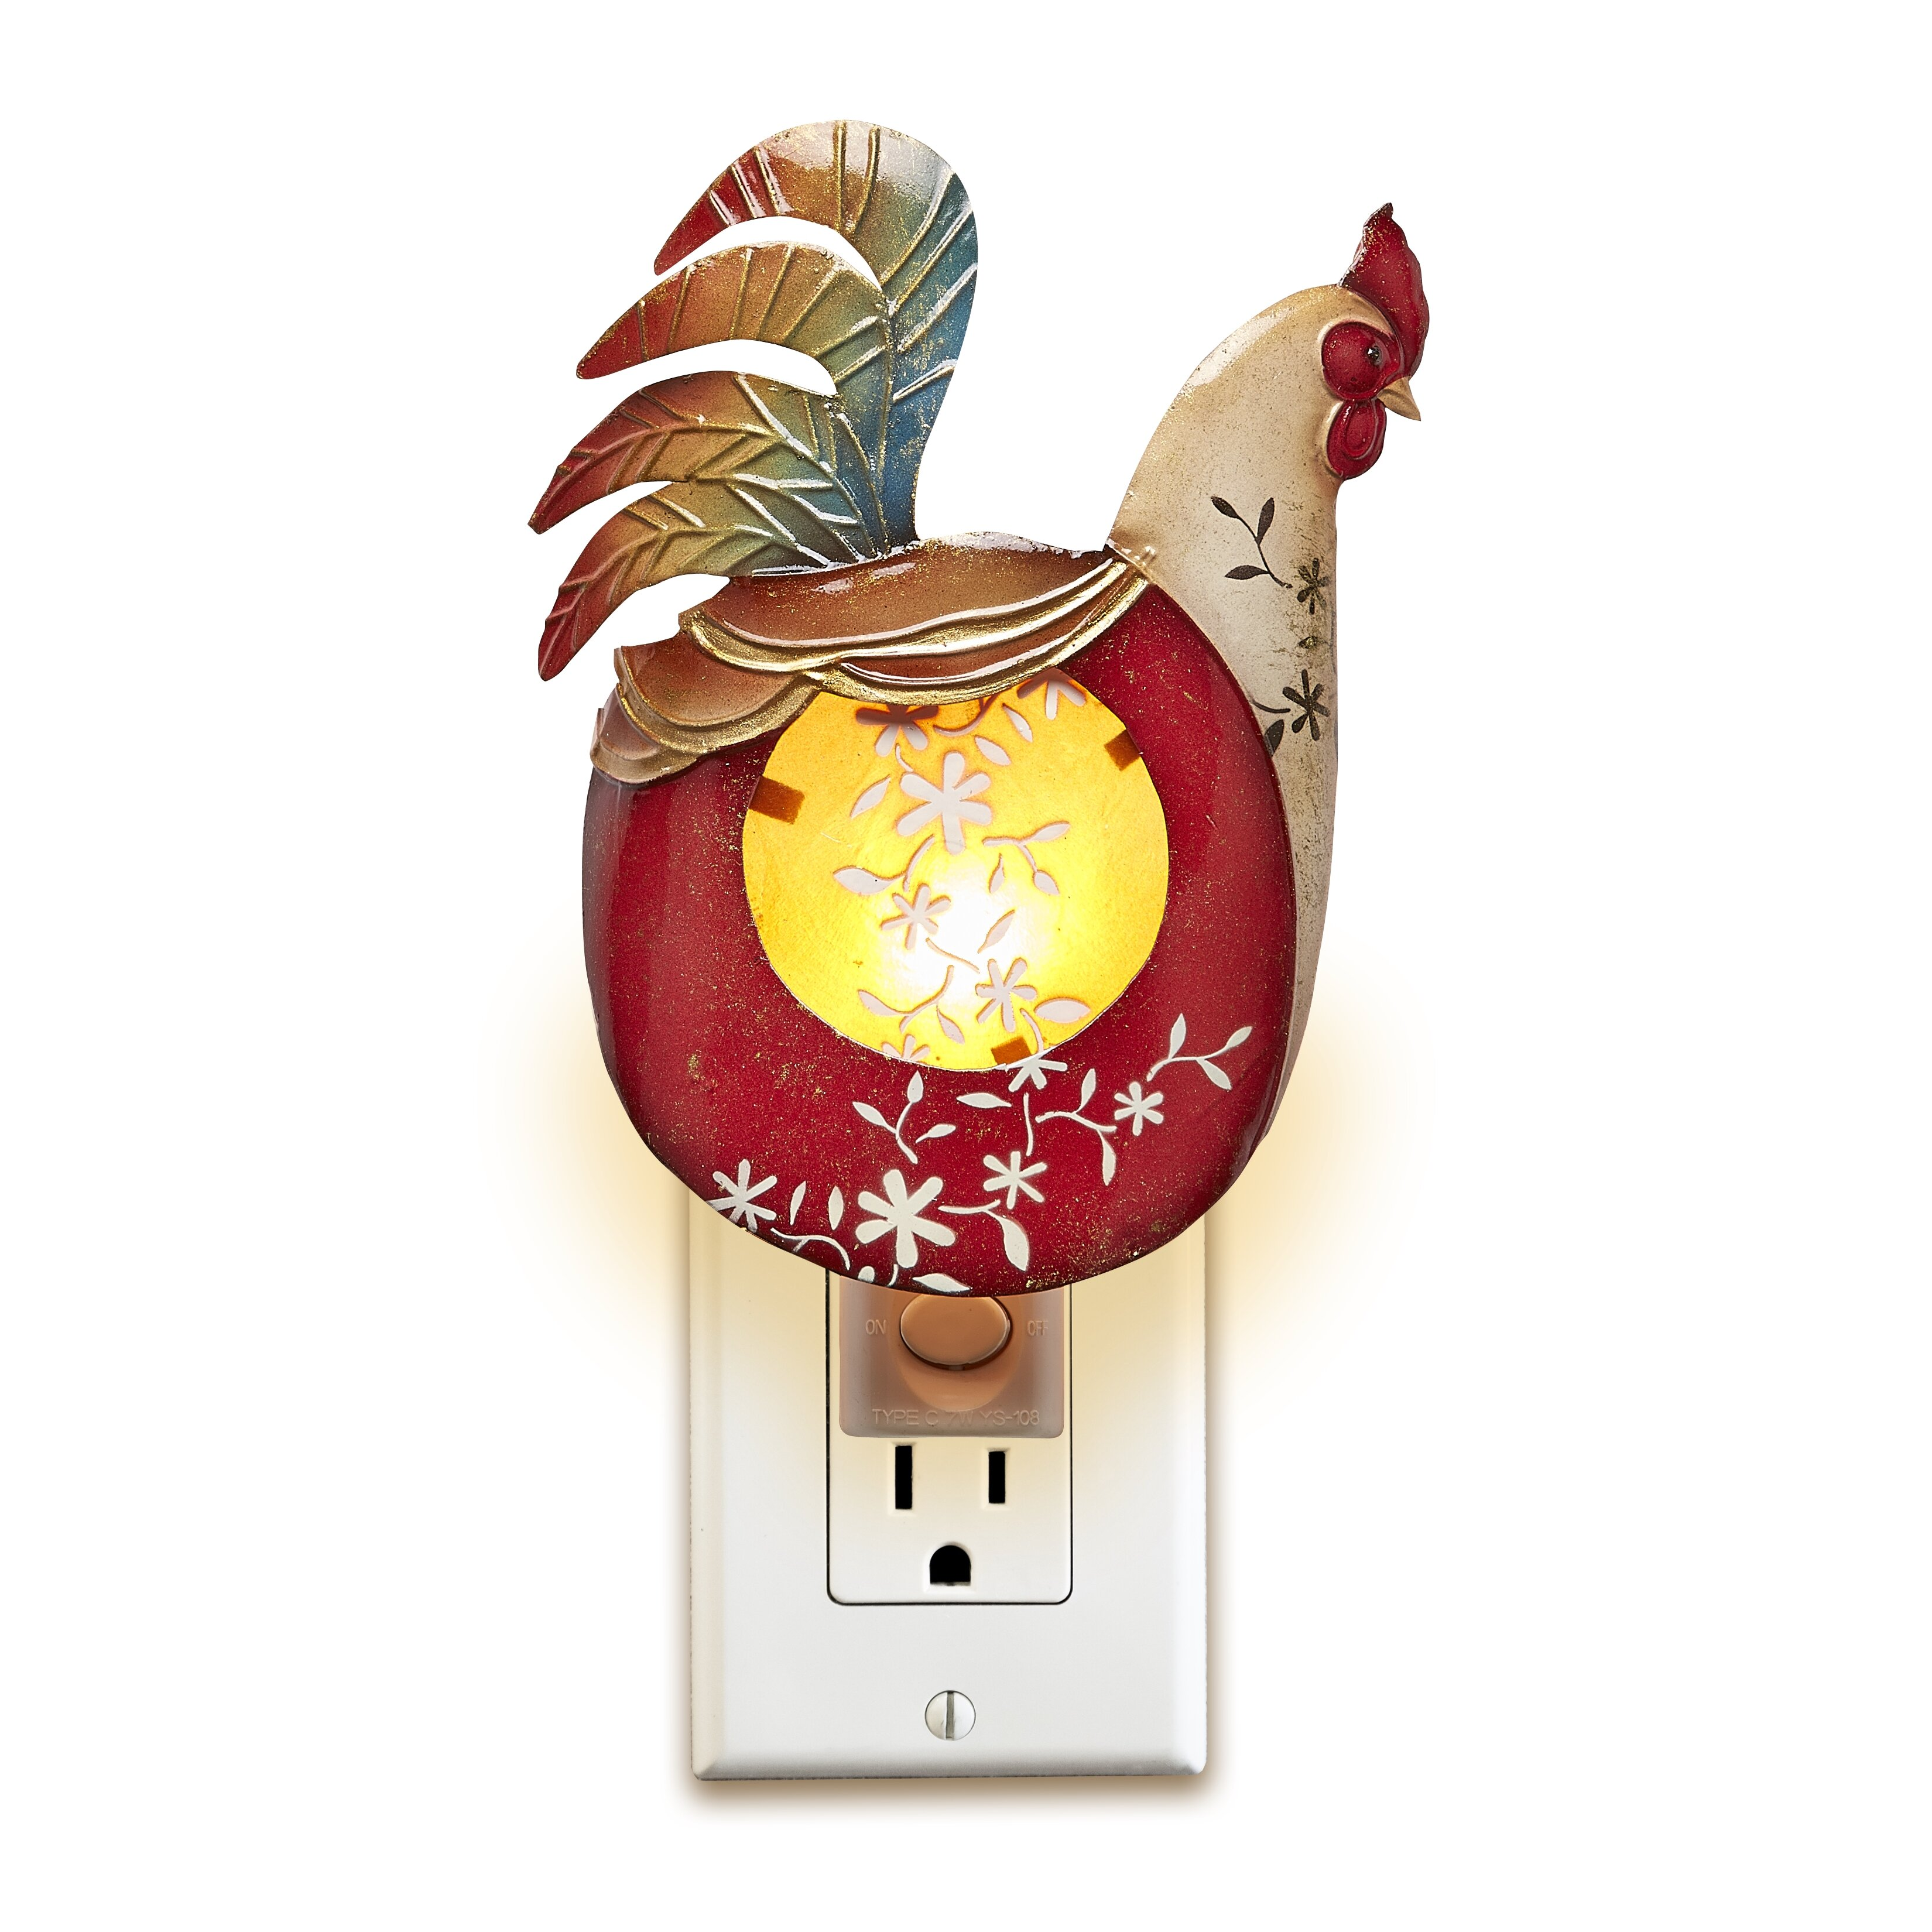 Automatic night lights decorative - Automatic Night Lights Decorative 56